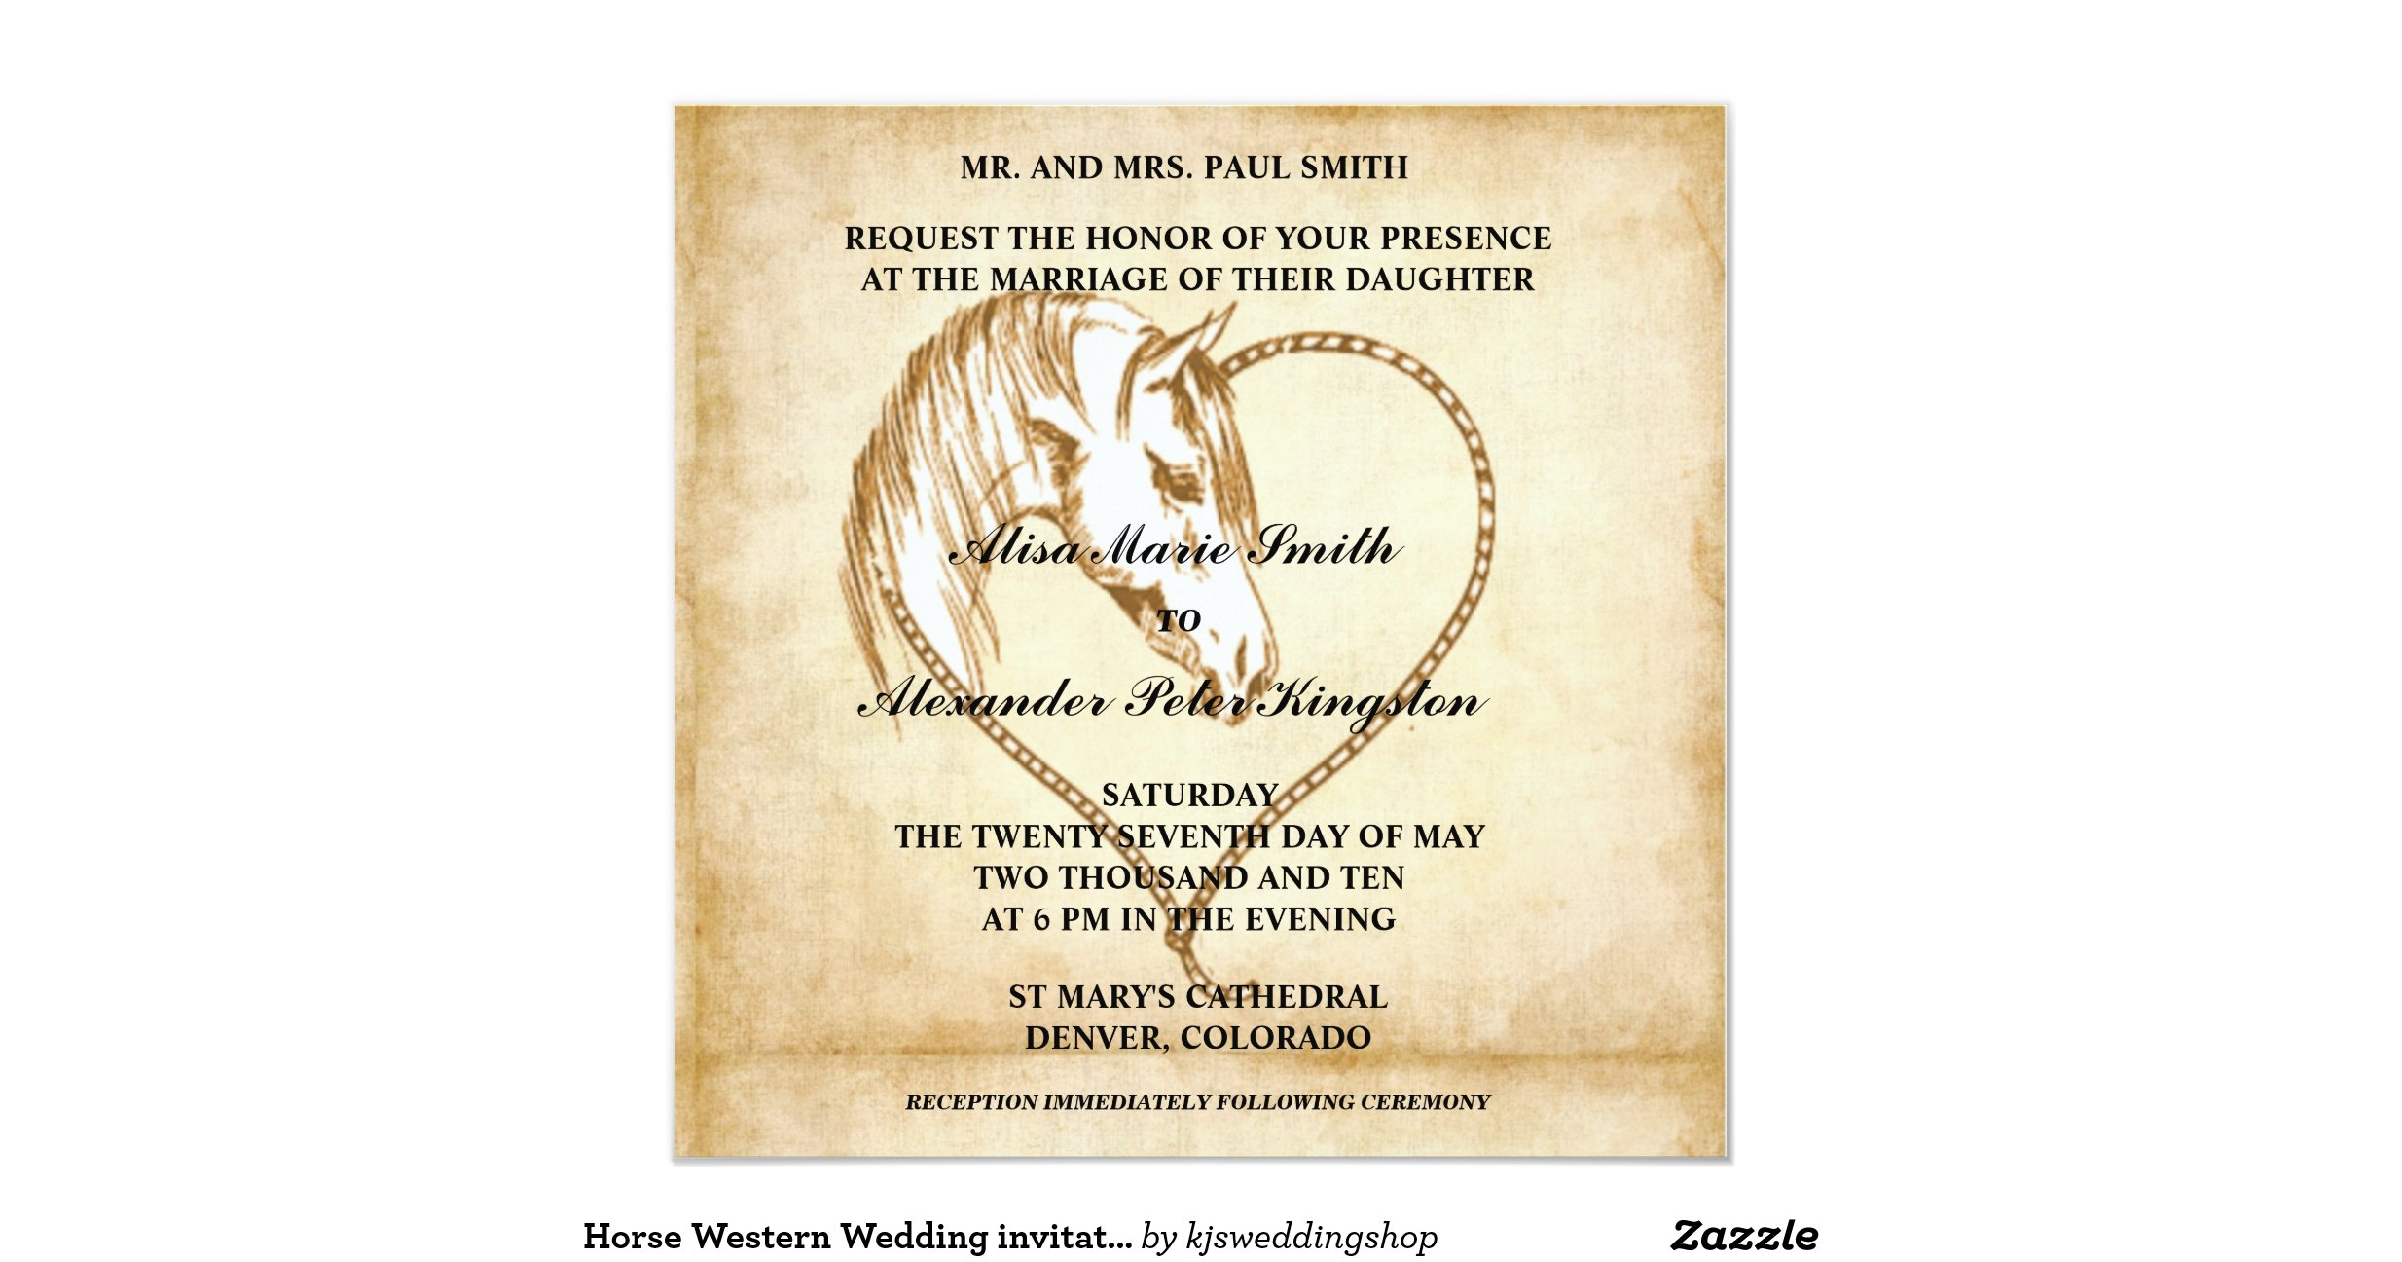 Western Wedding Invites: Horse_western_wedding_invitations_announcements